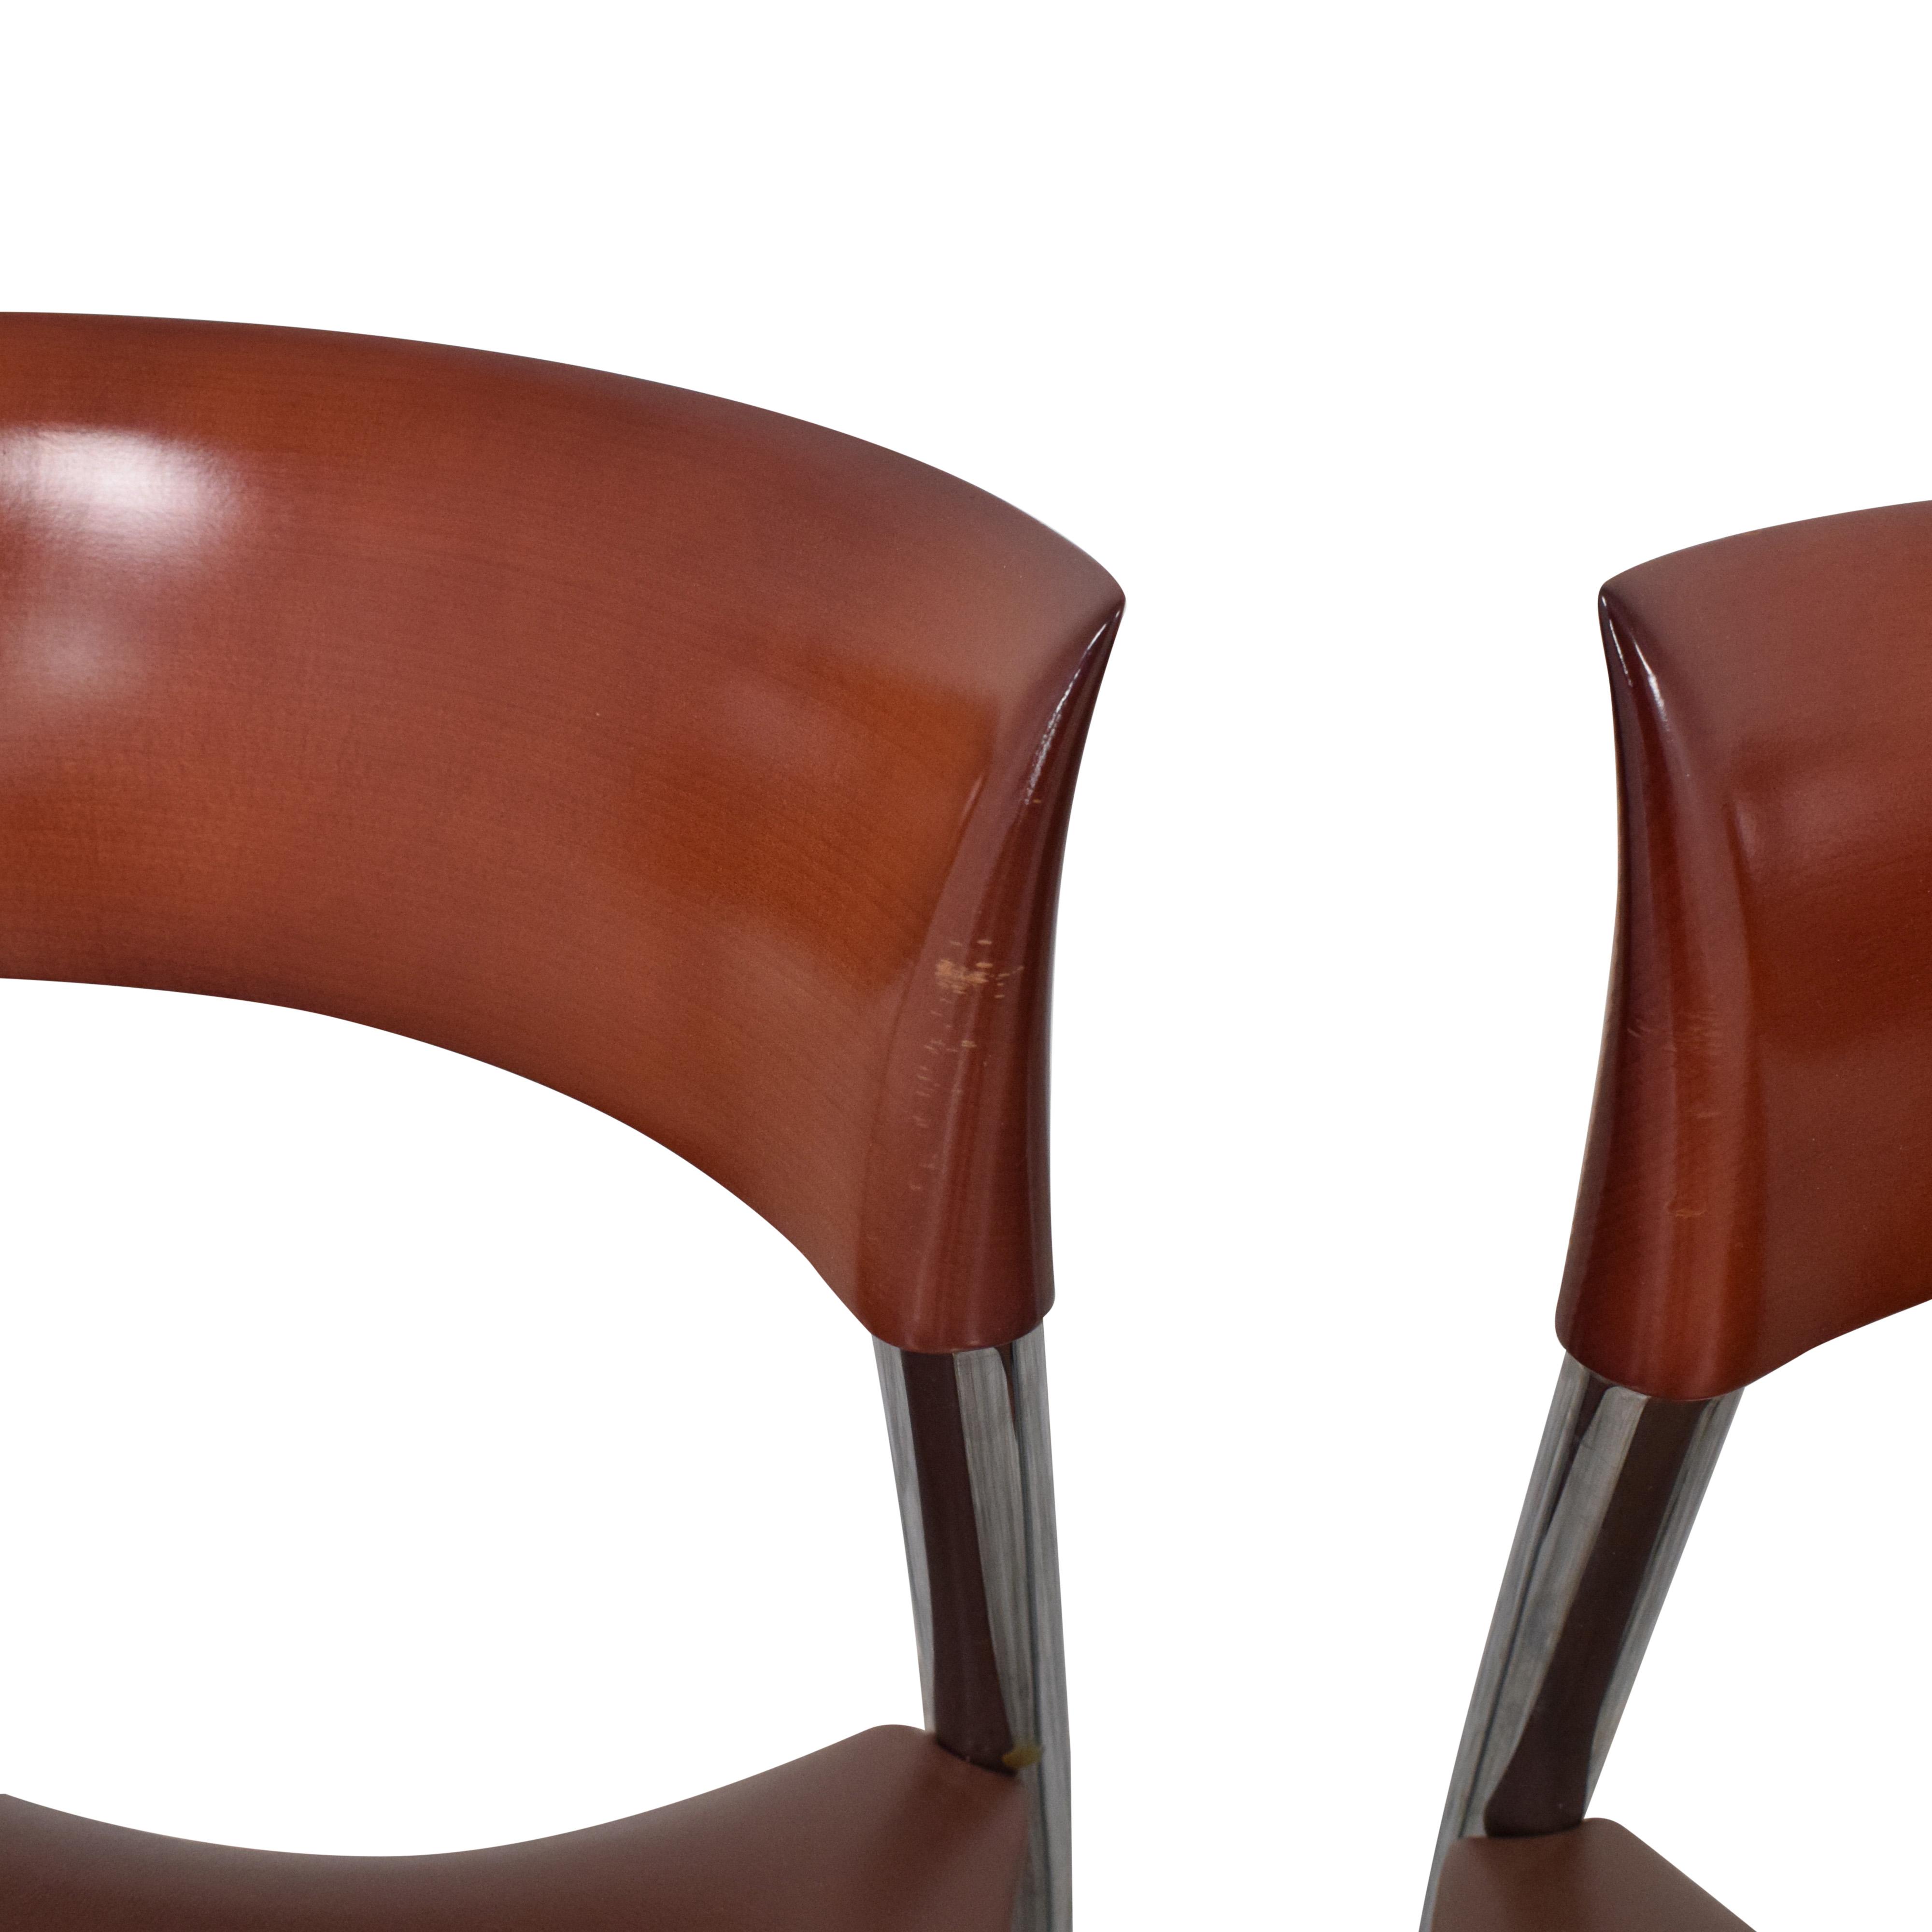 Loewenstein Loewenstein Dining Chairs